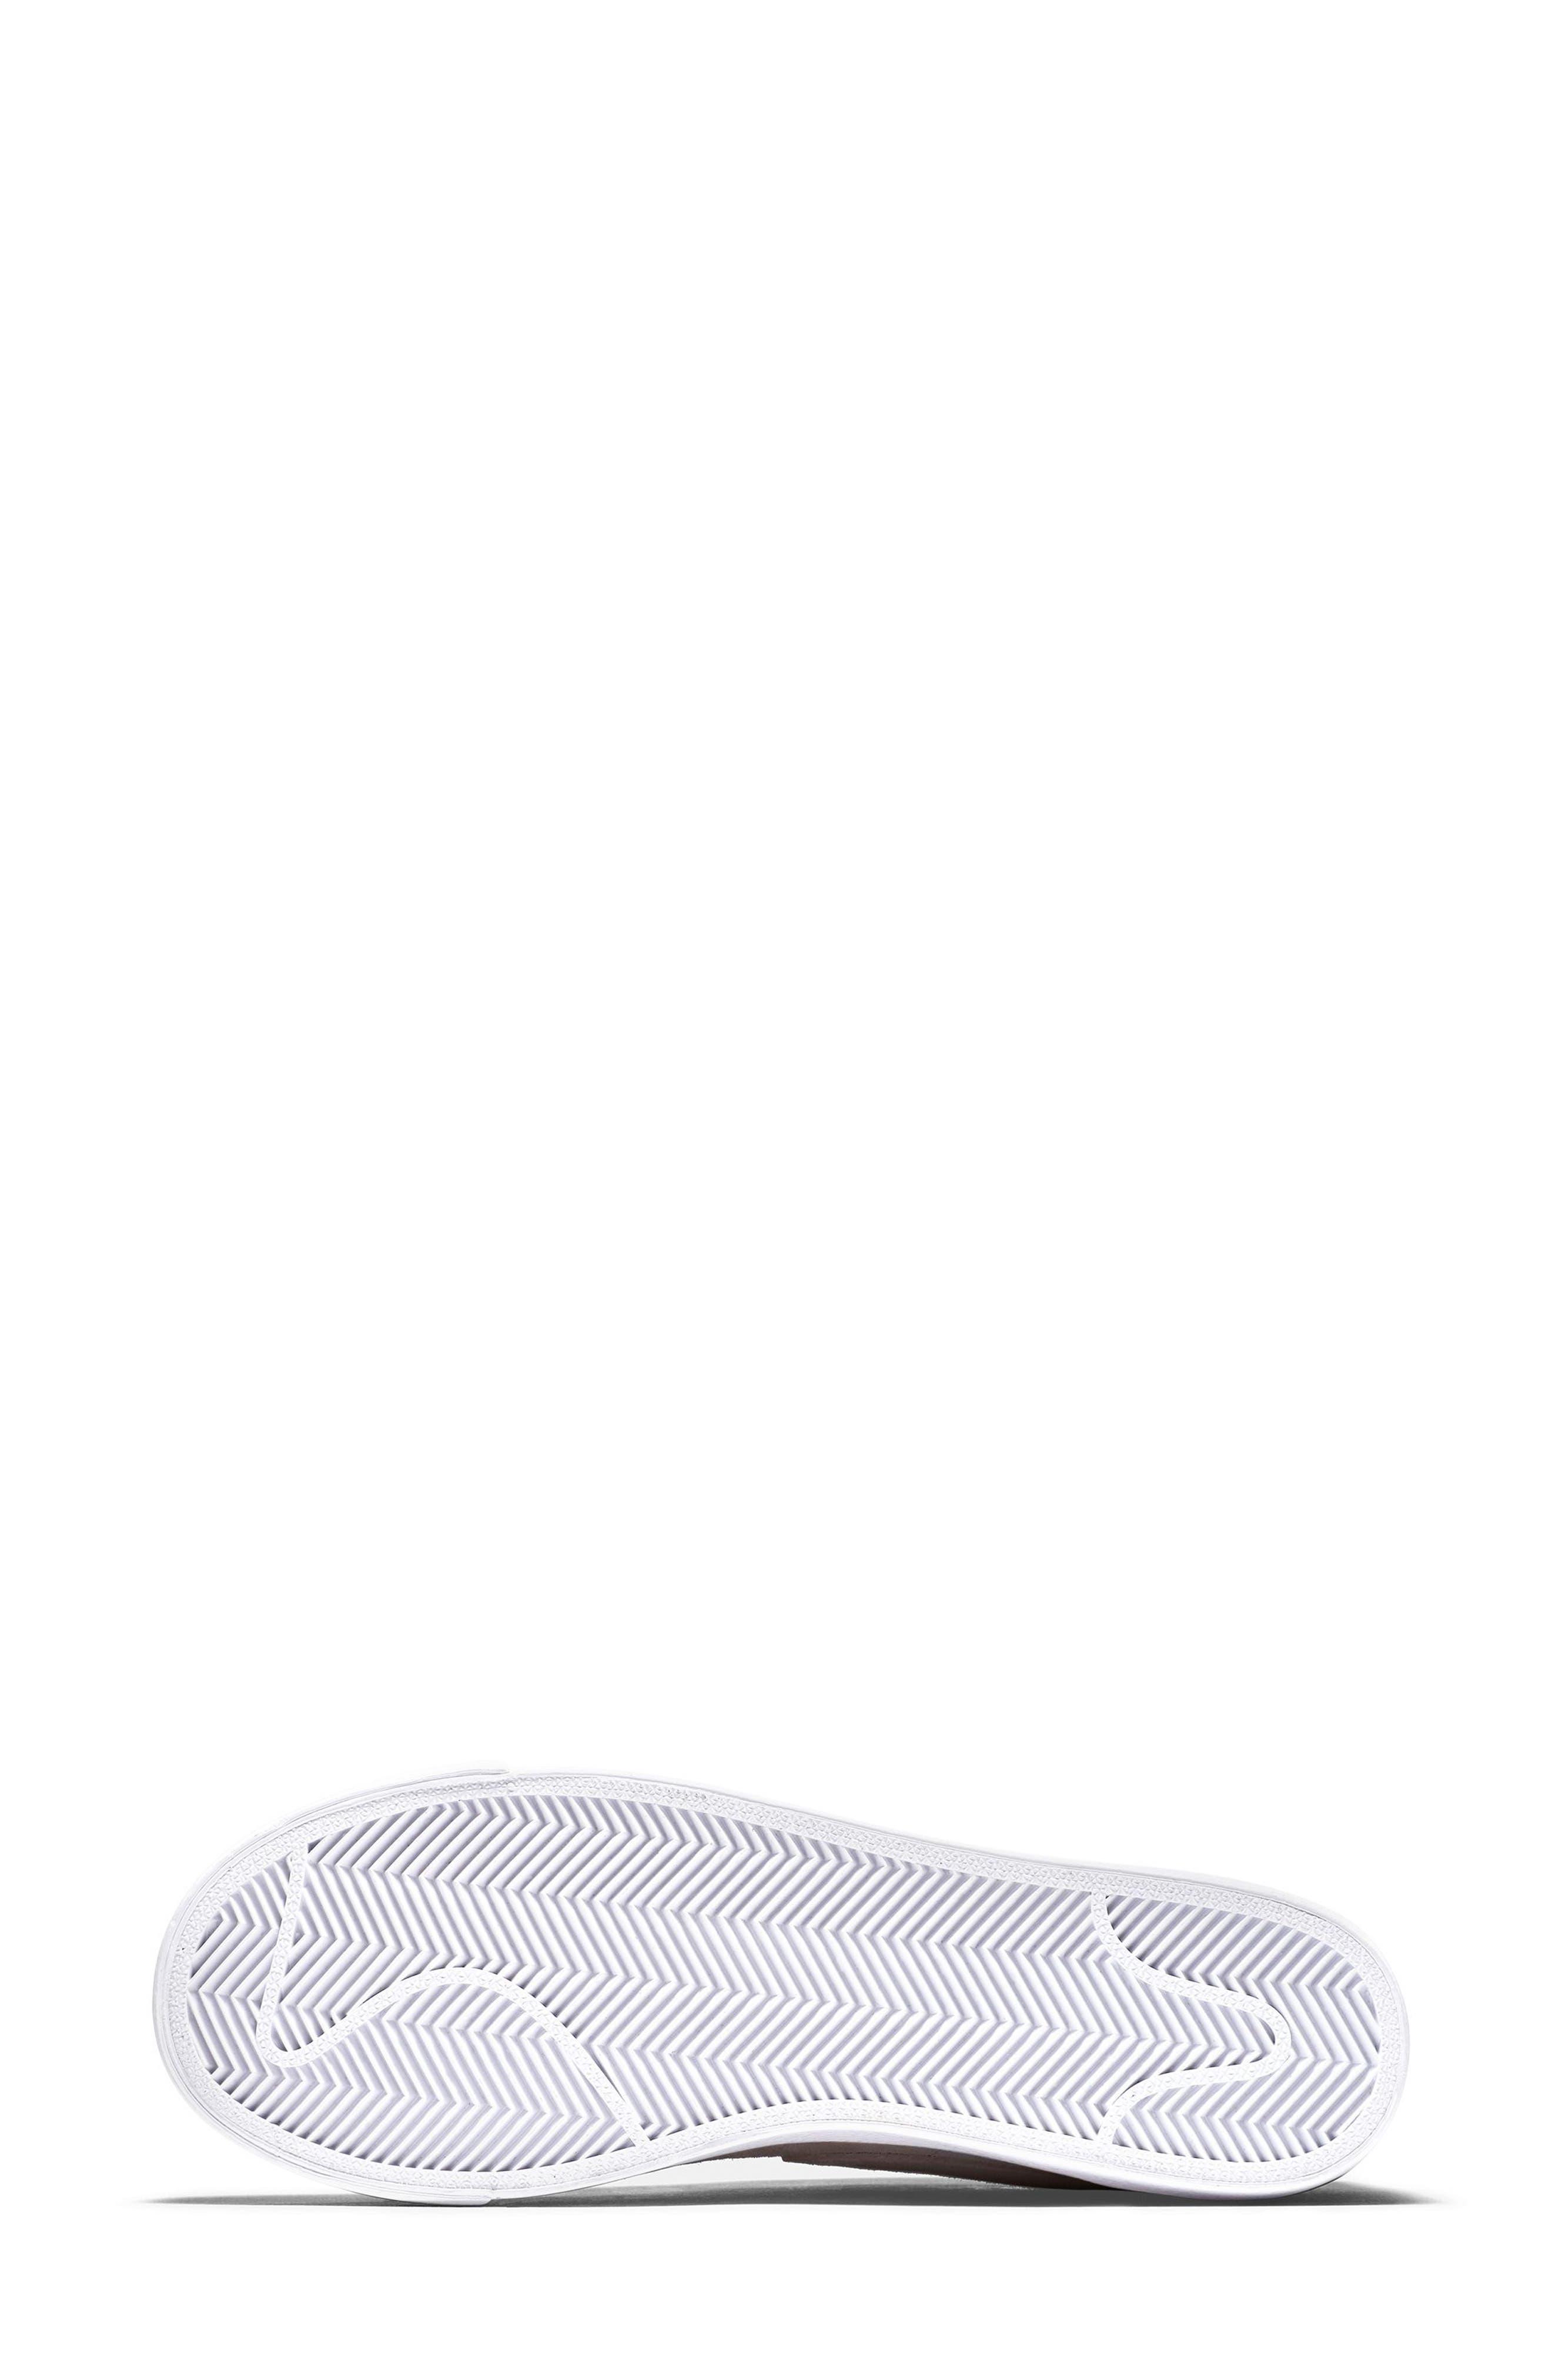 Blazer Low LX Sneaker,                             Alternate thumbnail 6, color,                             Silt Red/ Brown/ White